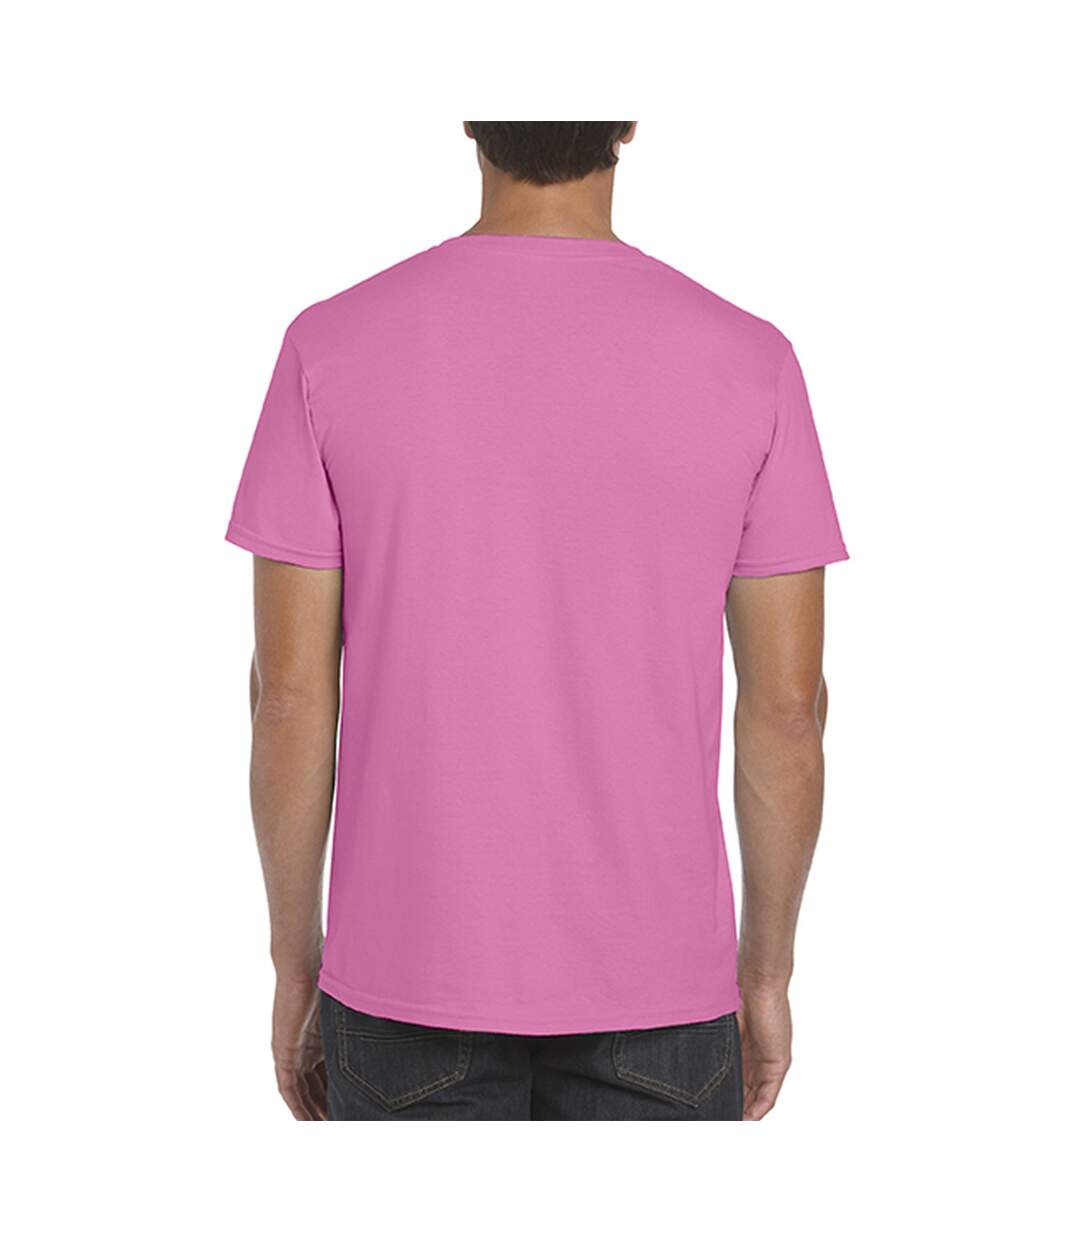 Gildan Mens Short Sleeve Soft-Style T-Shirt (Azalea) - UTBC484